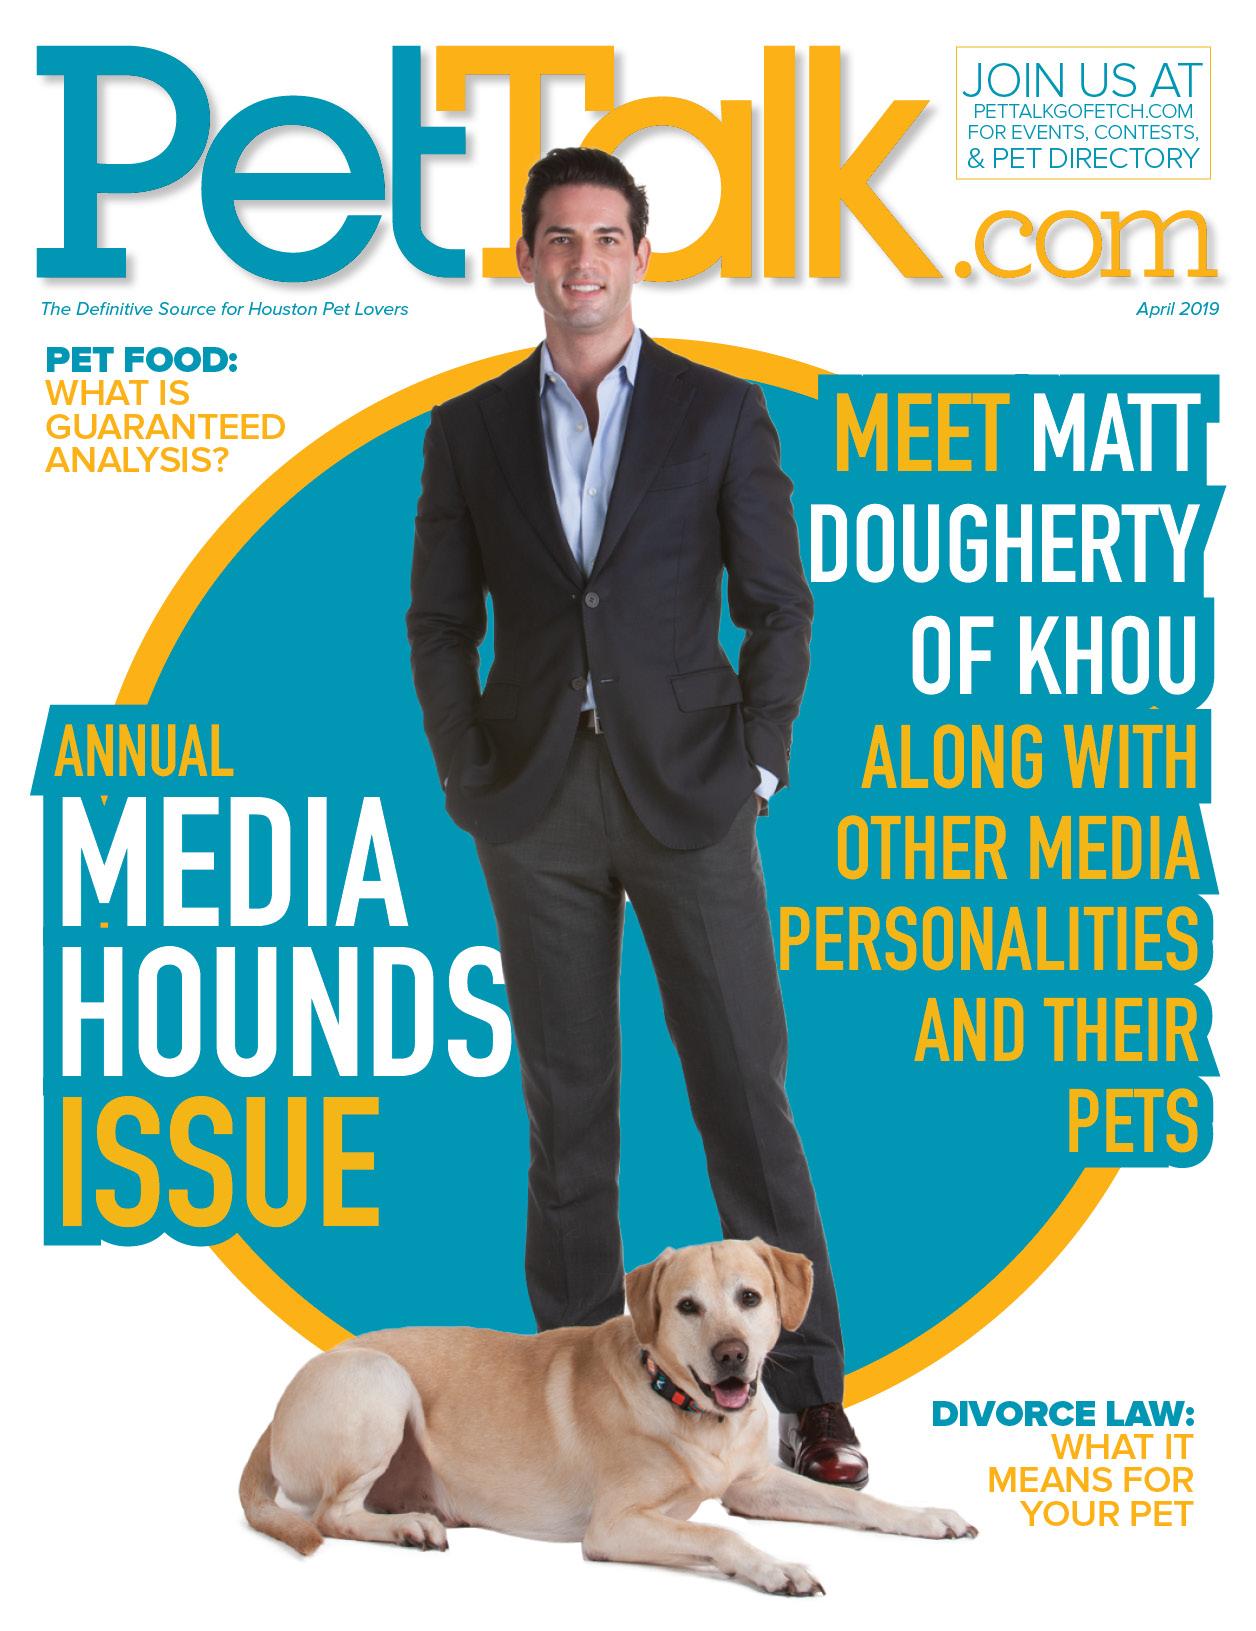 April 2019 Digital Issue of Houston PetTalk